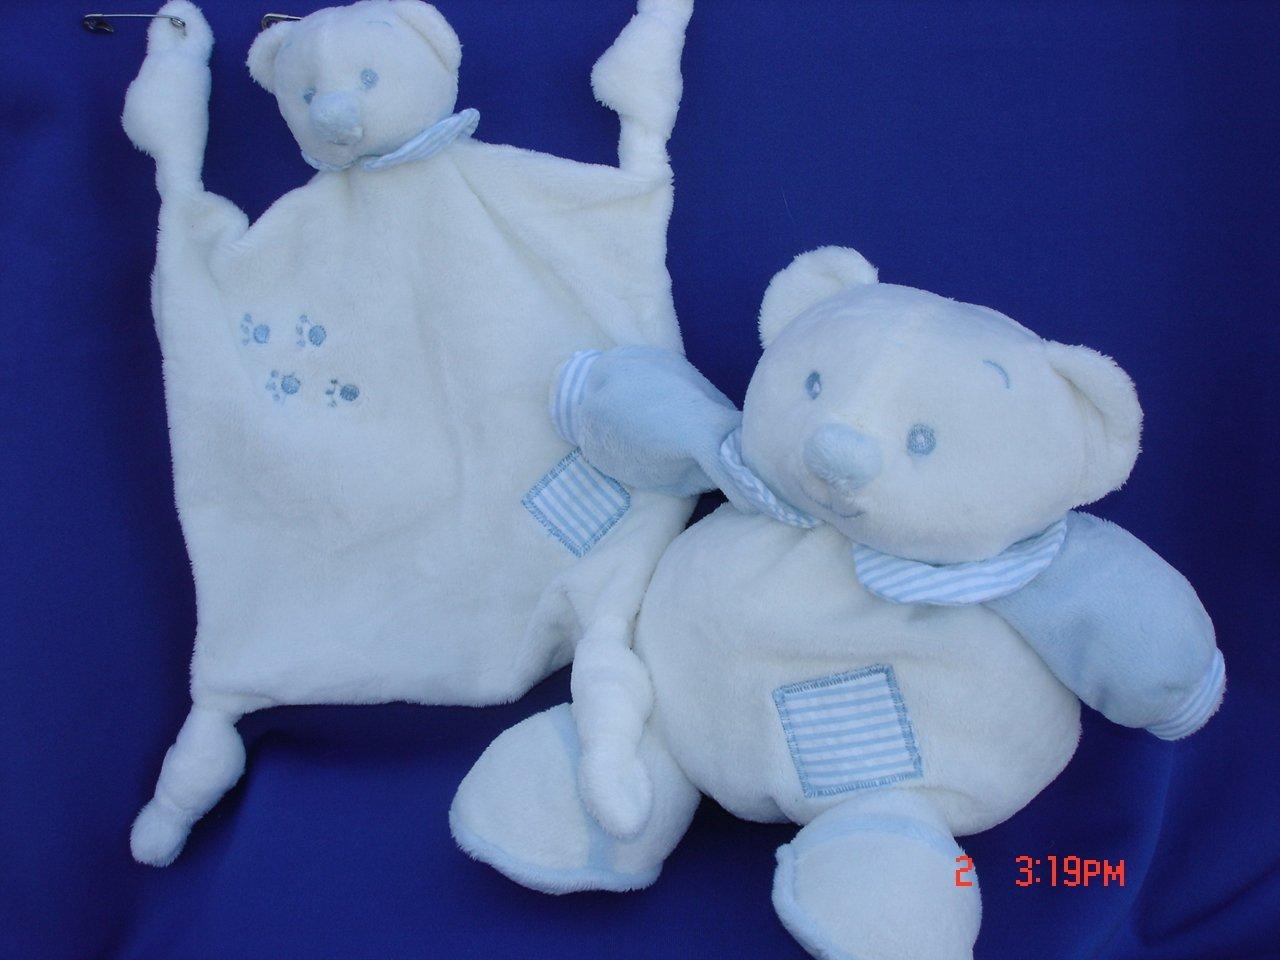 "Ultra Soft Baby Blue Teddy Bear Plush Blankie 7.5""x7.5"" Security Blanket Lovie and My First Baby Blue Plush Teddy Bear Stuffed Animal Toy Rattle 7"" Tall, 2 Pcs Set"